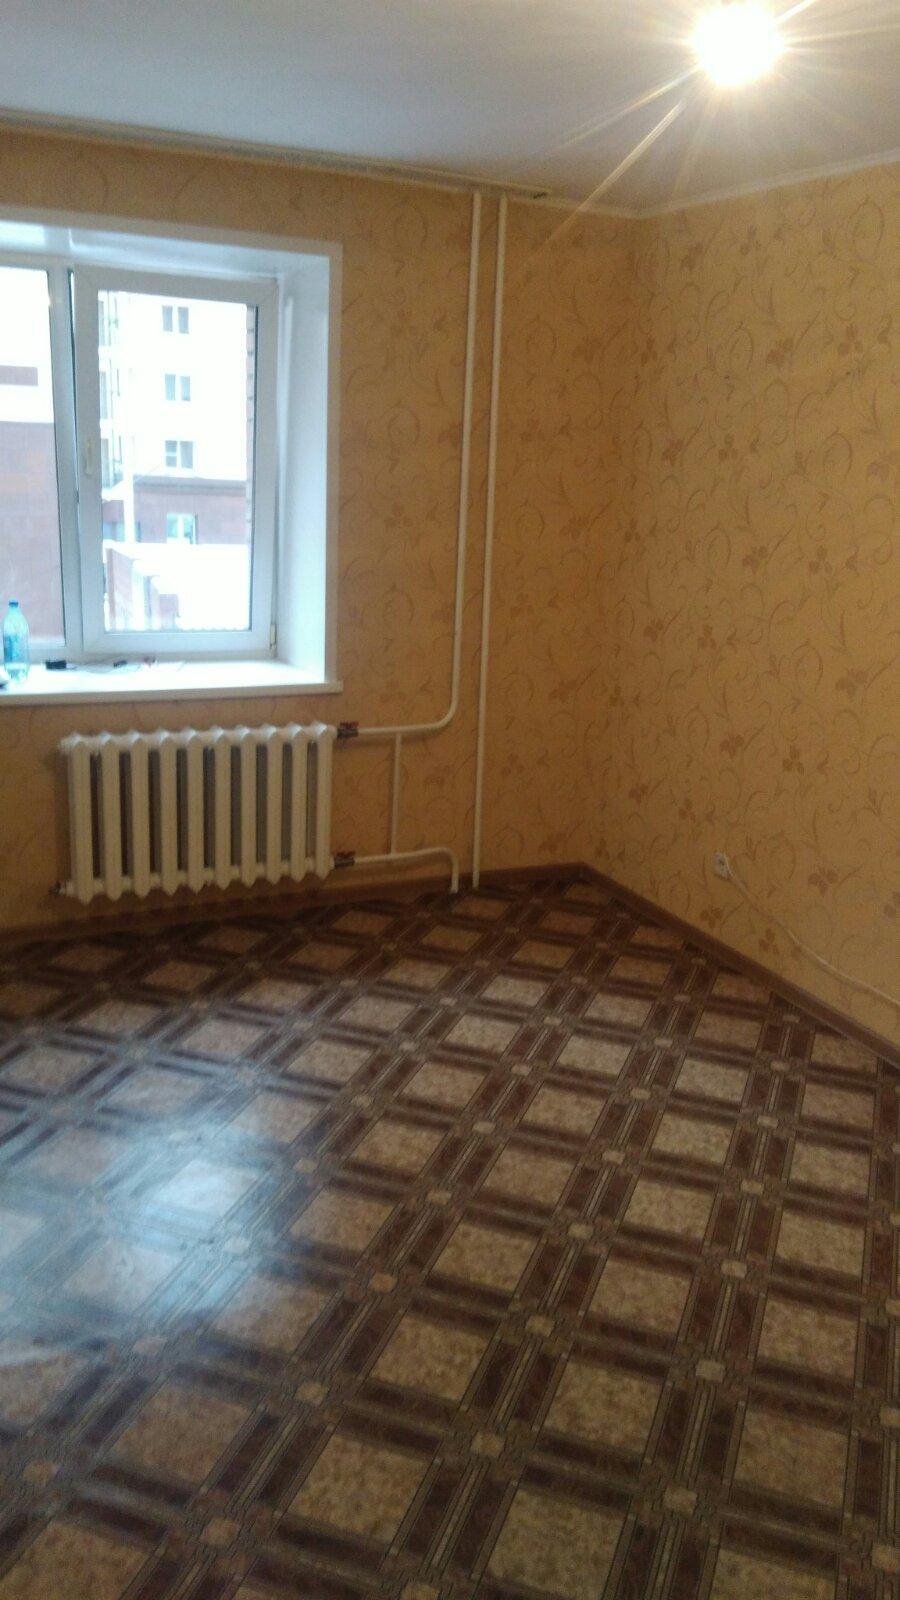 1к квартира улица Куйбышева, 97Г | 13000 | аренда в Красноярске фото 1